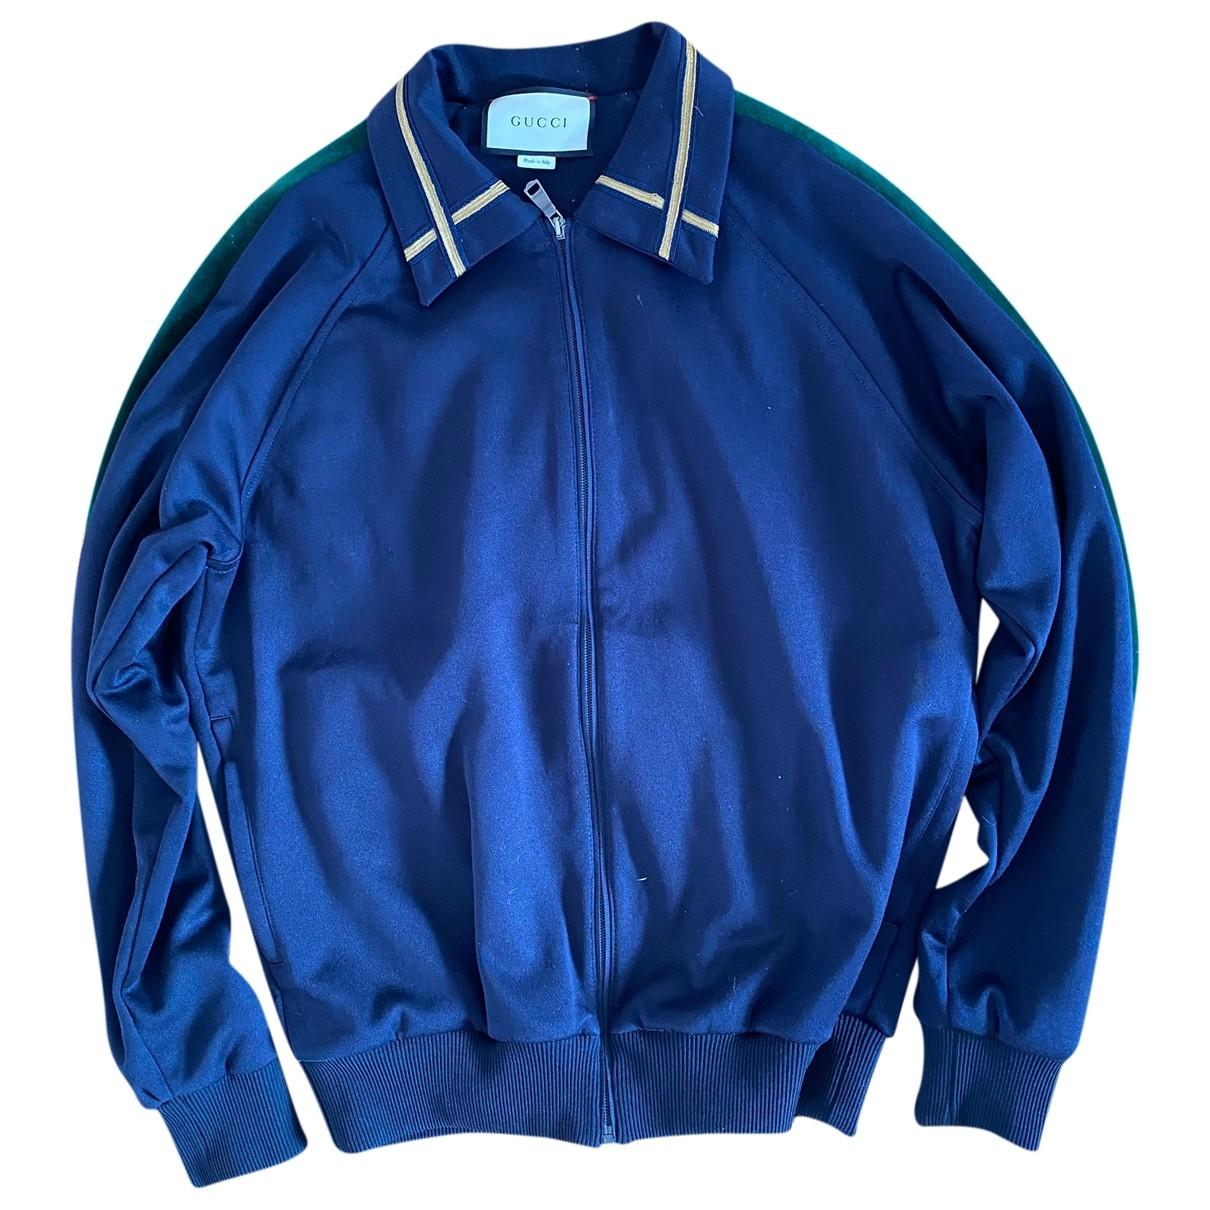 Gucci \N Multicolour Cotton Knitwear & Sweatshirts for Men S International